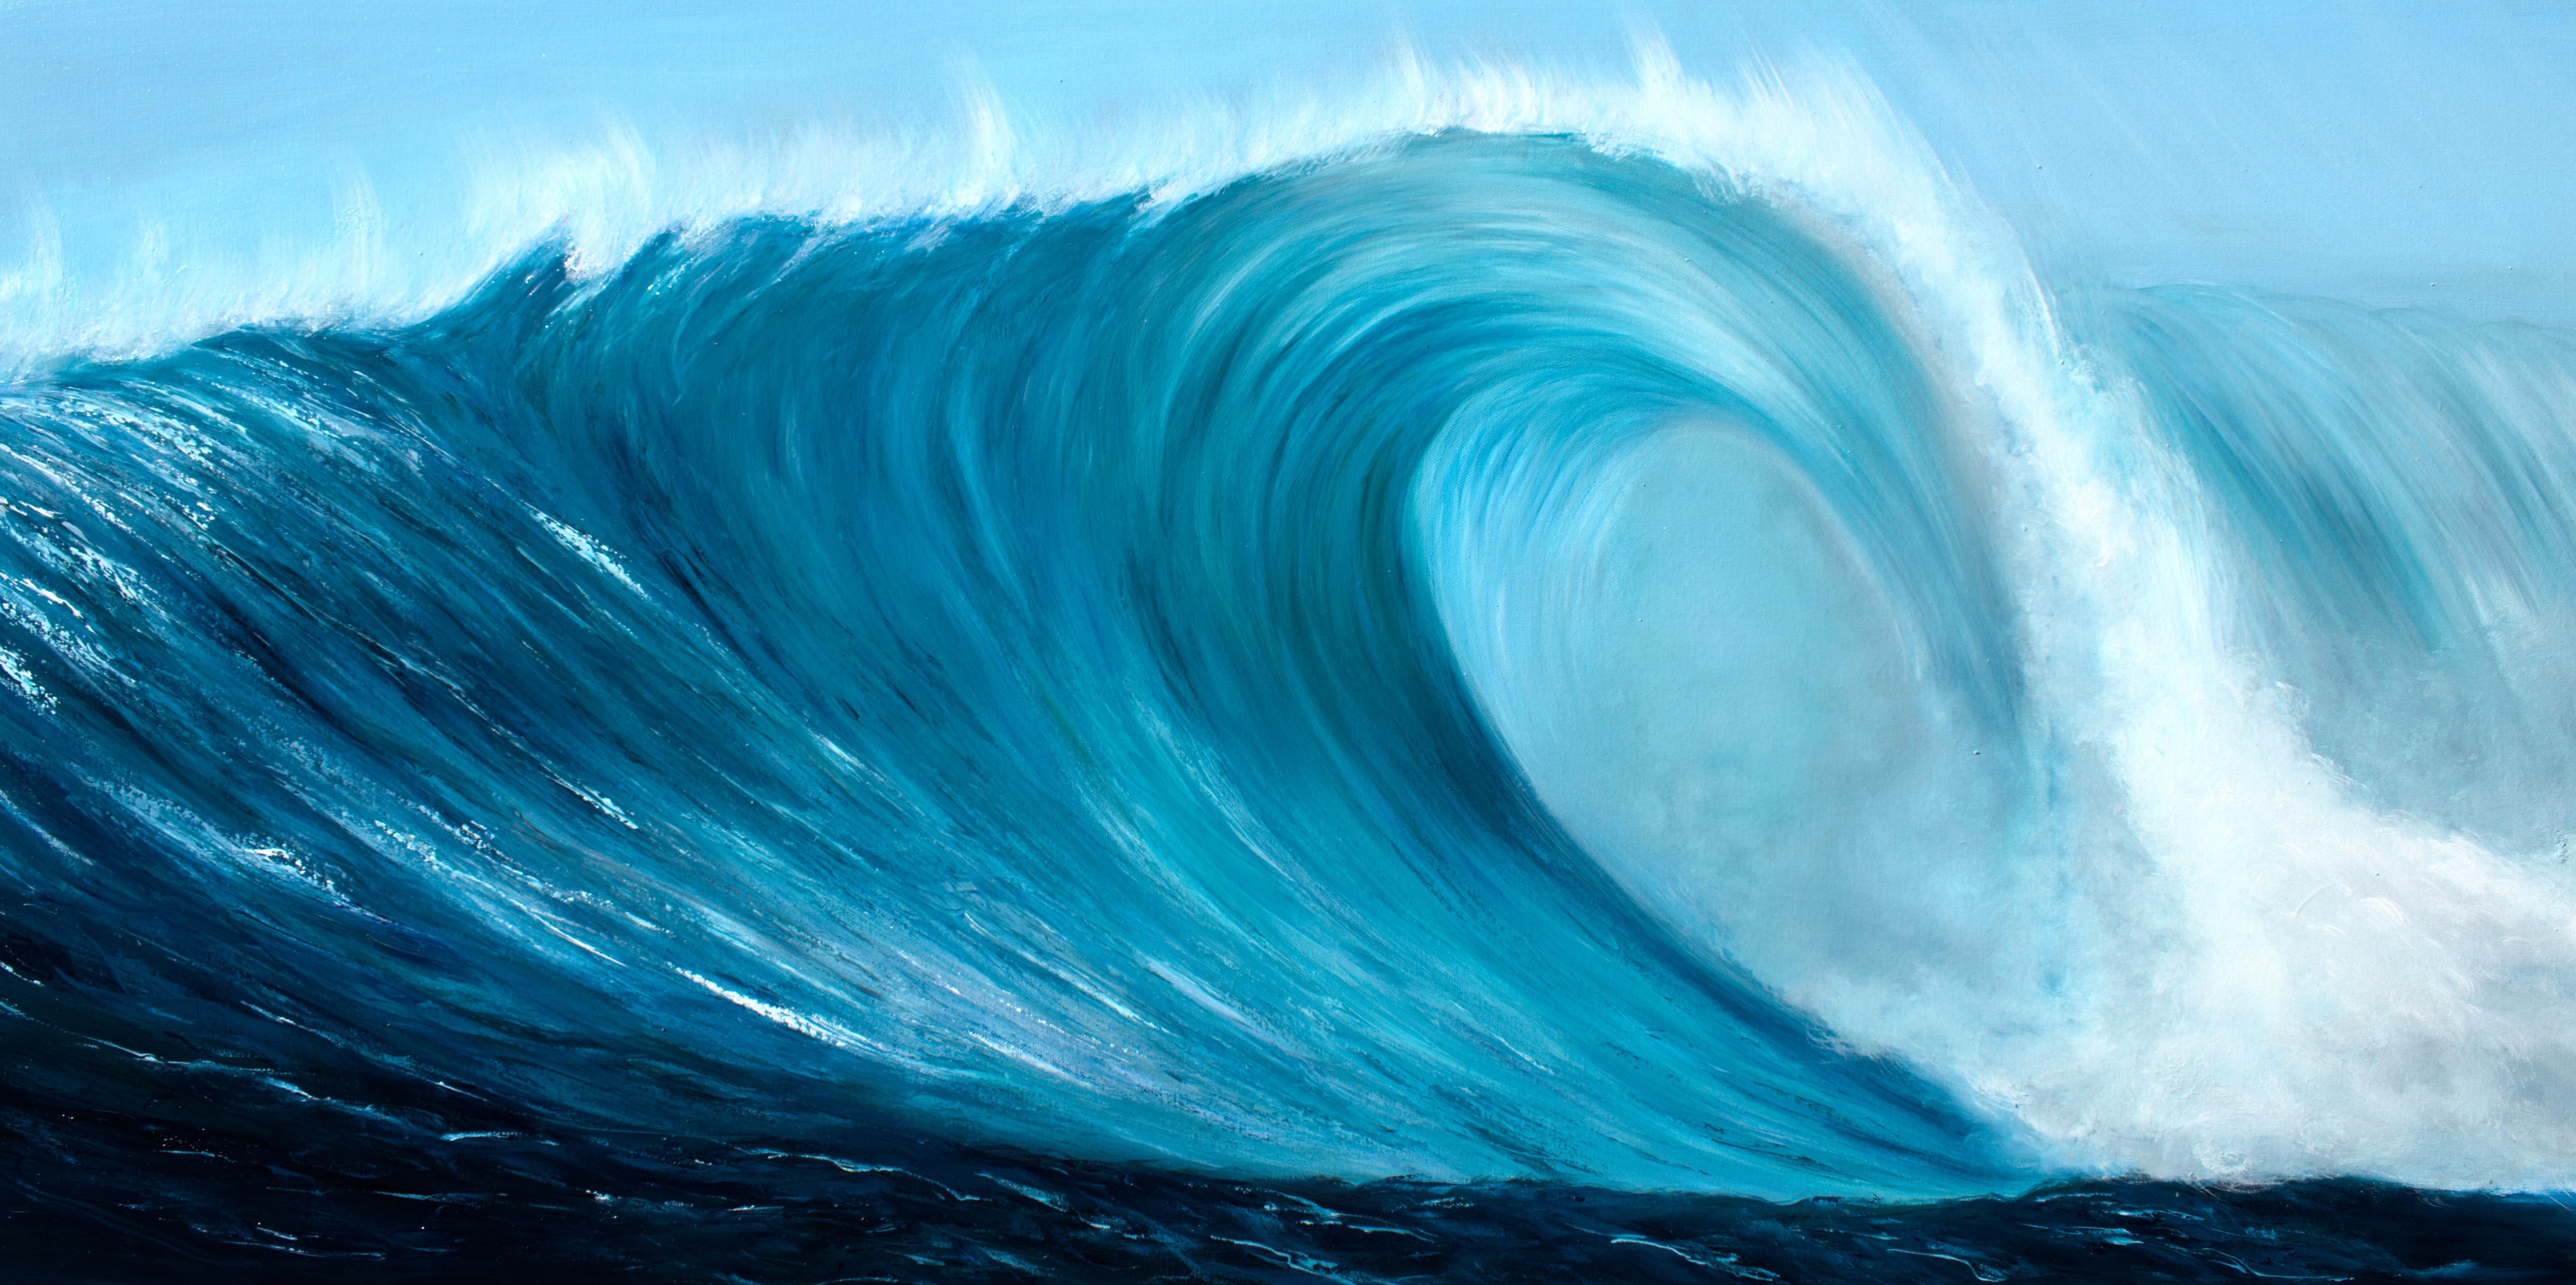 Turquoise Wave VI fine art giclee print